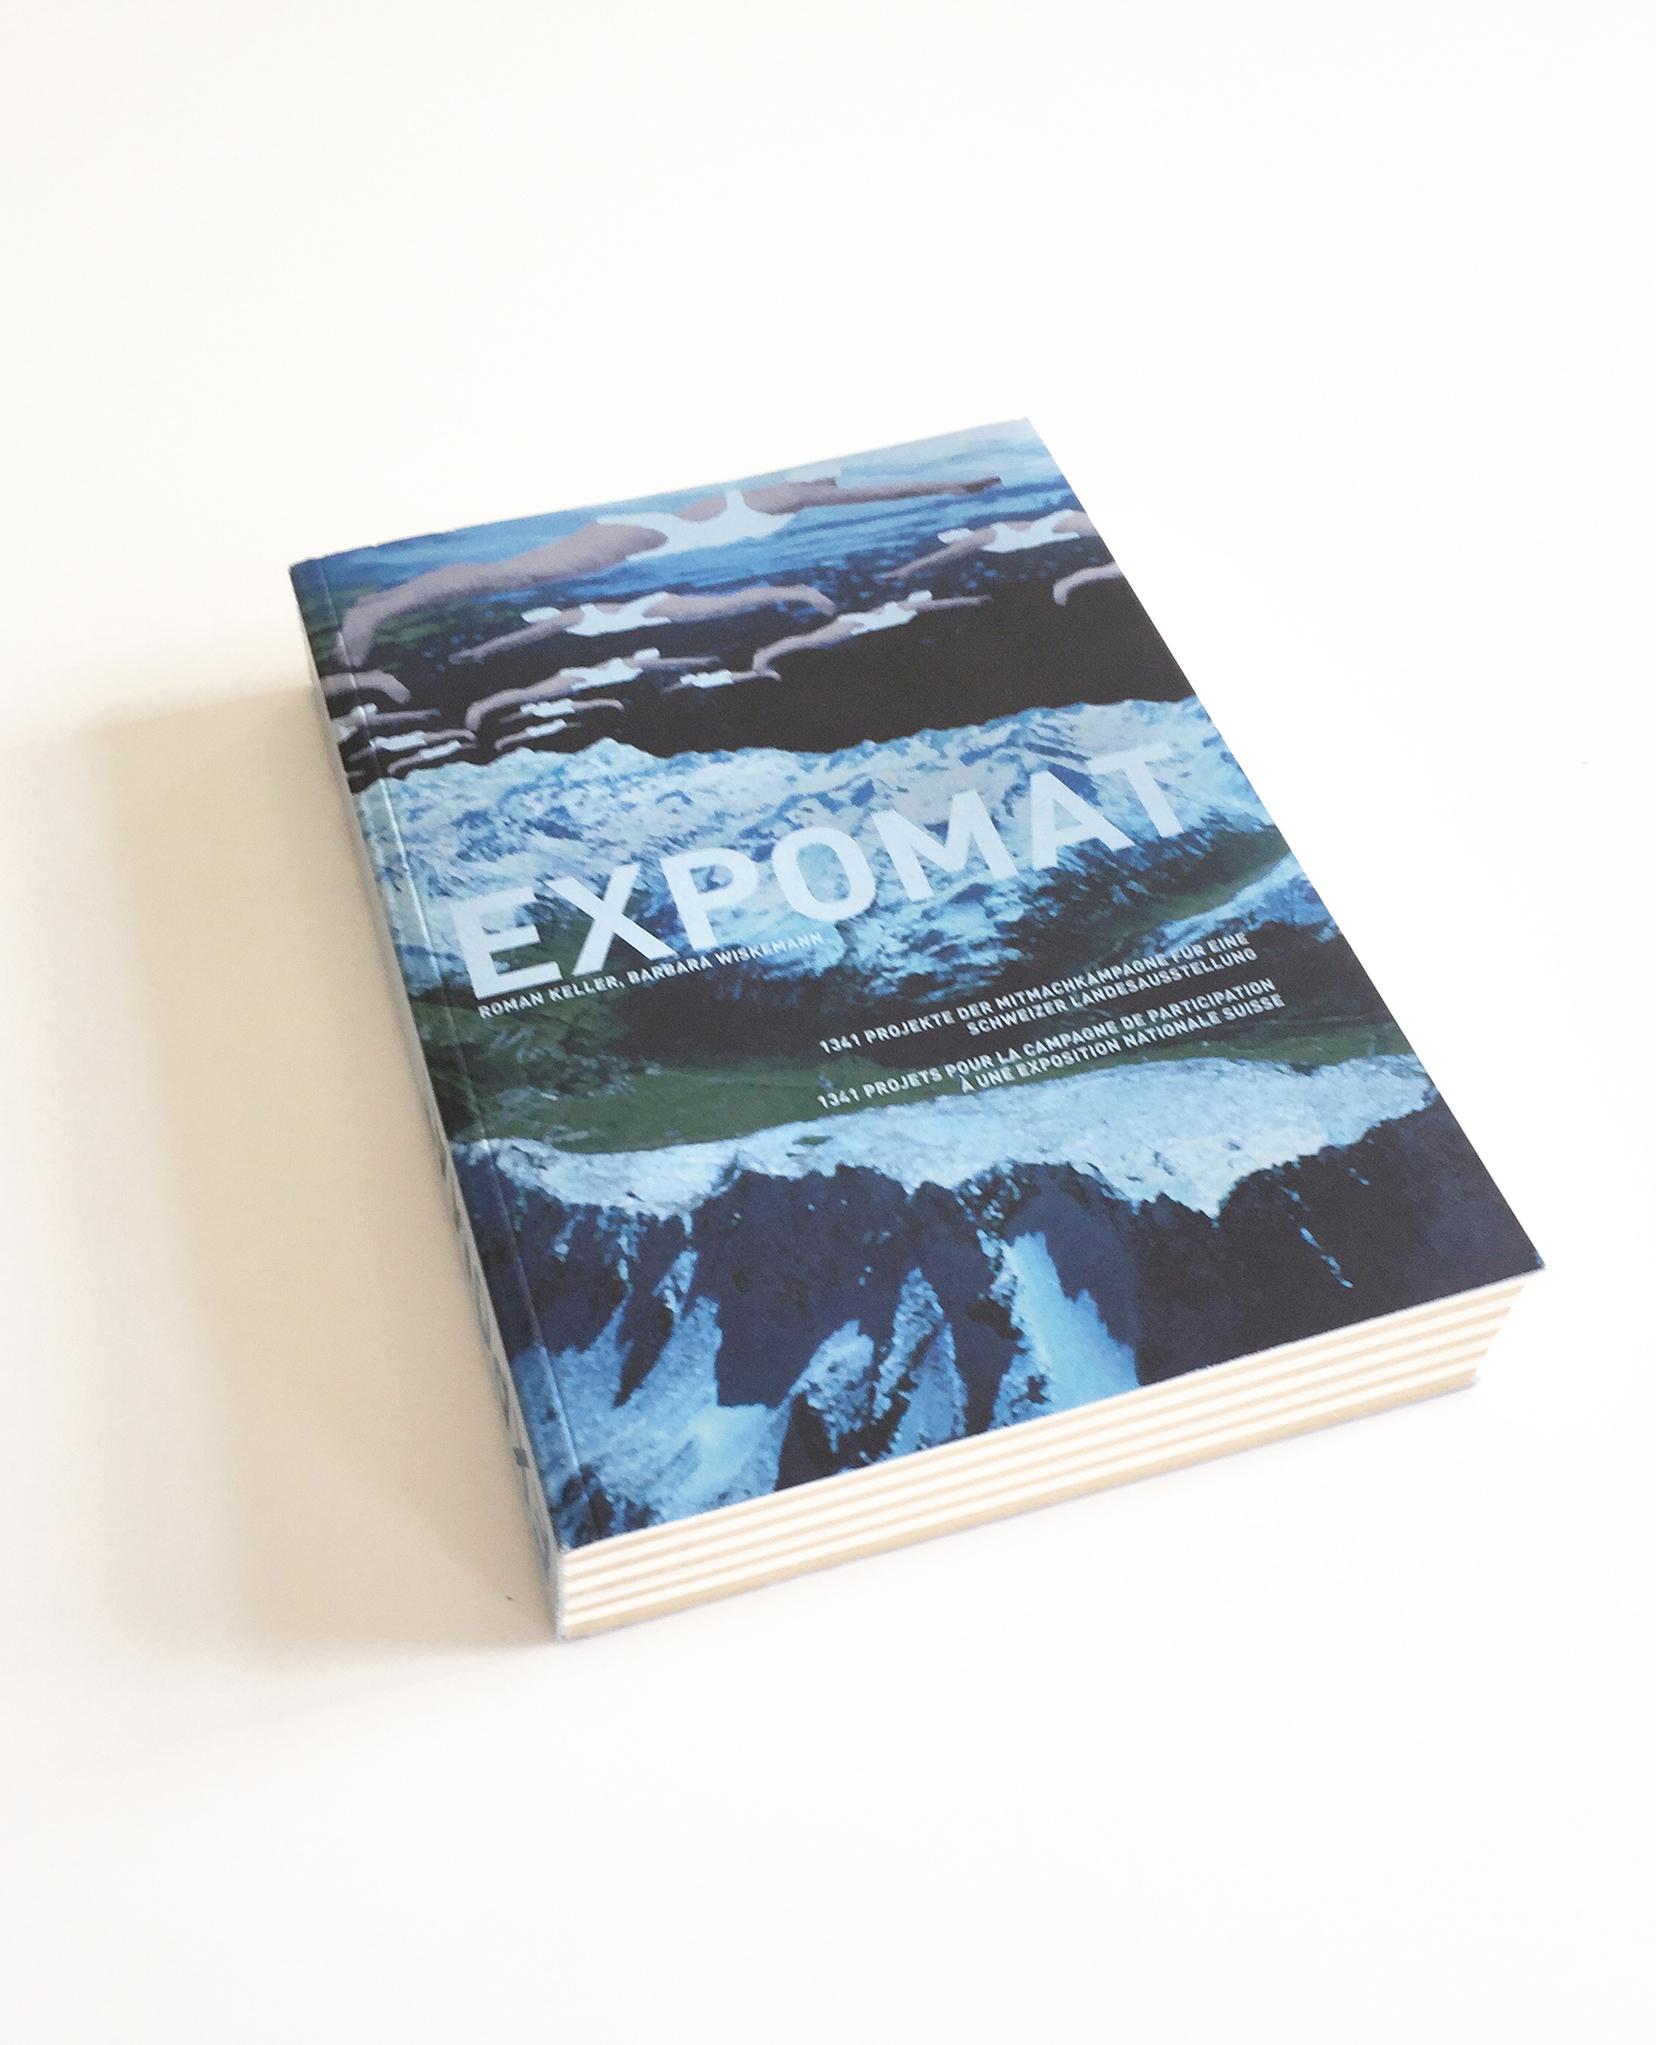 """EXPOMAT"""